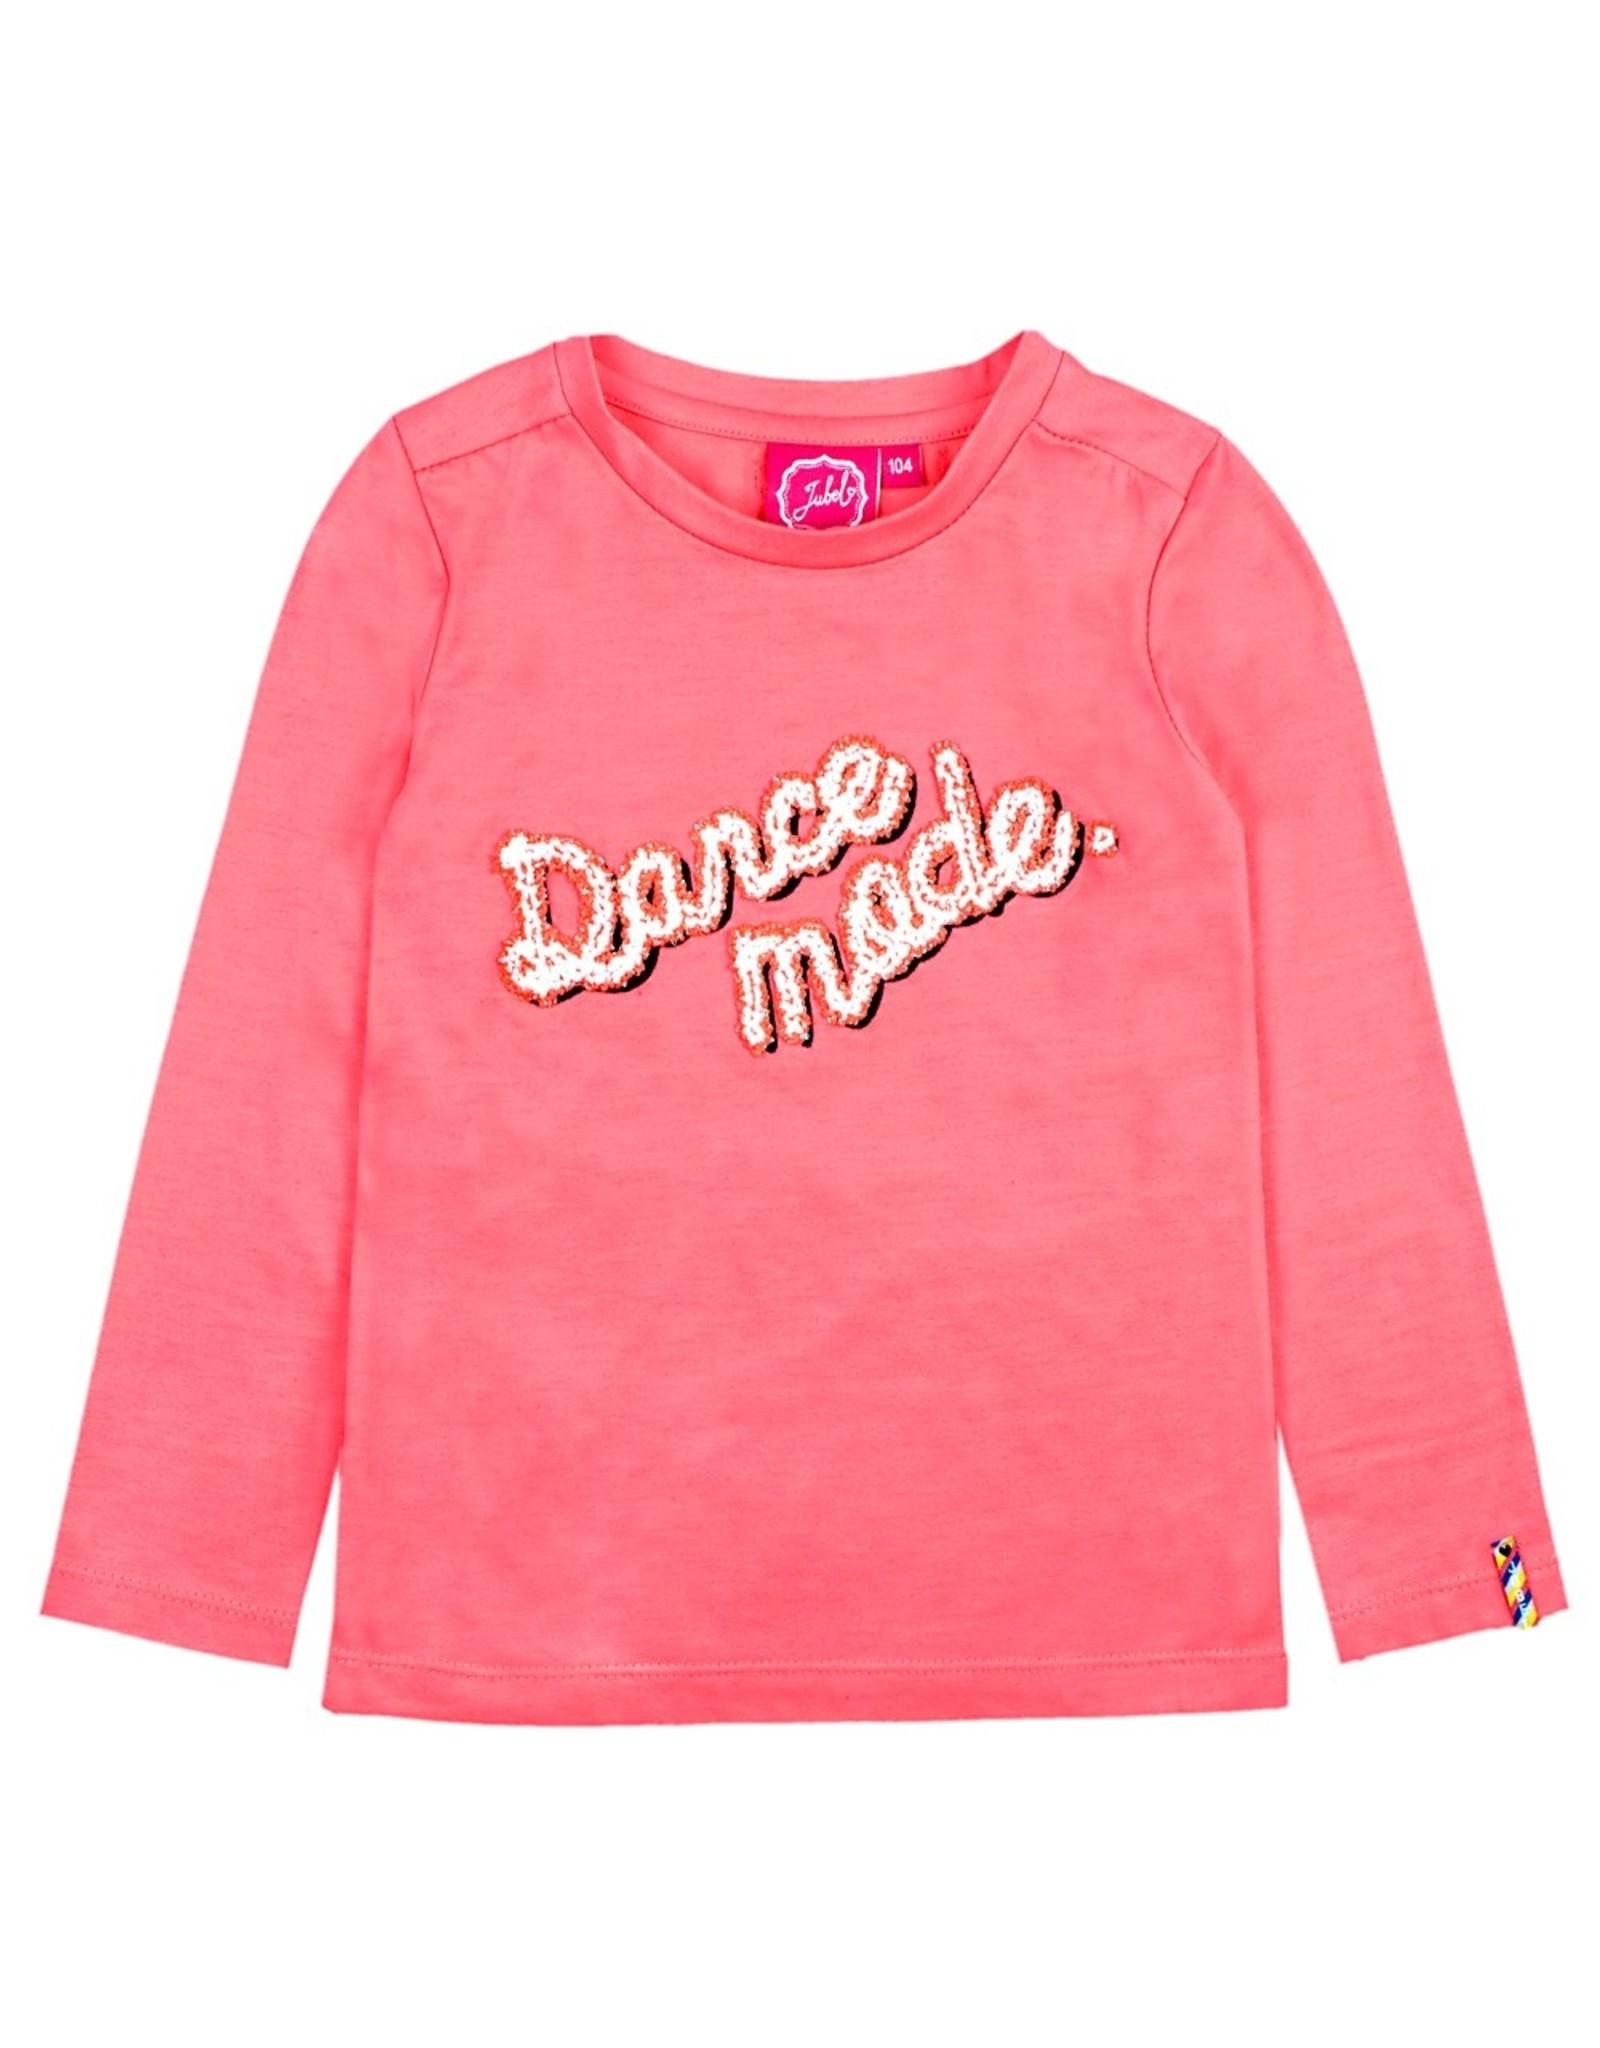 Jubel Longsleeve Dance Mode - Pret-A-Party